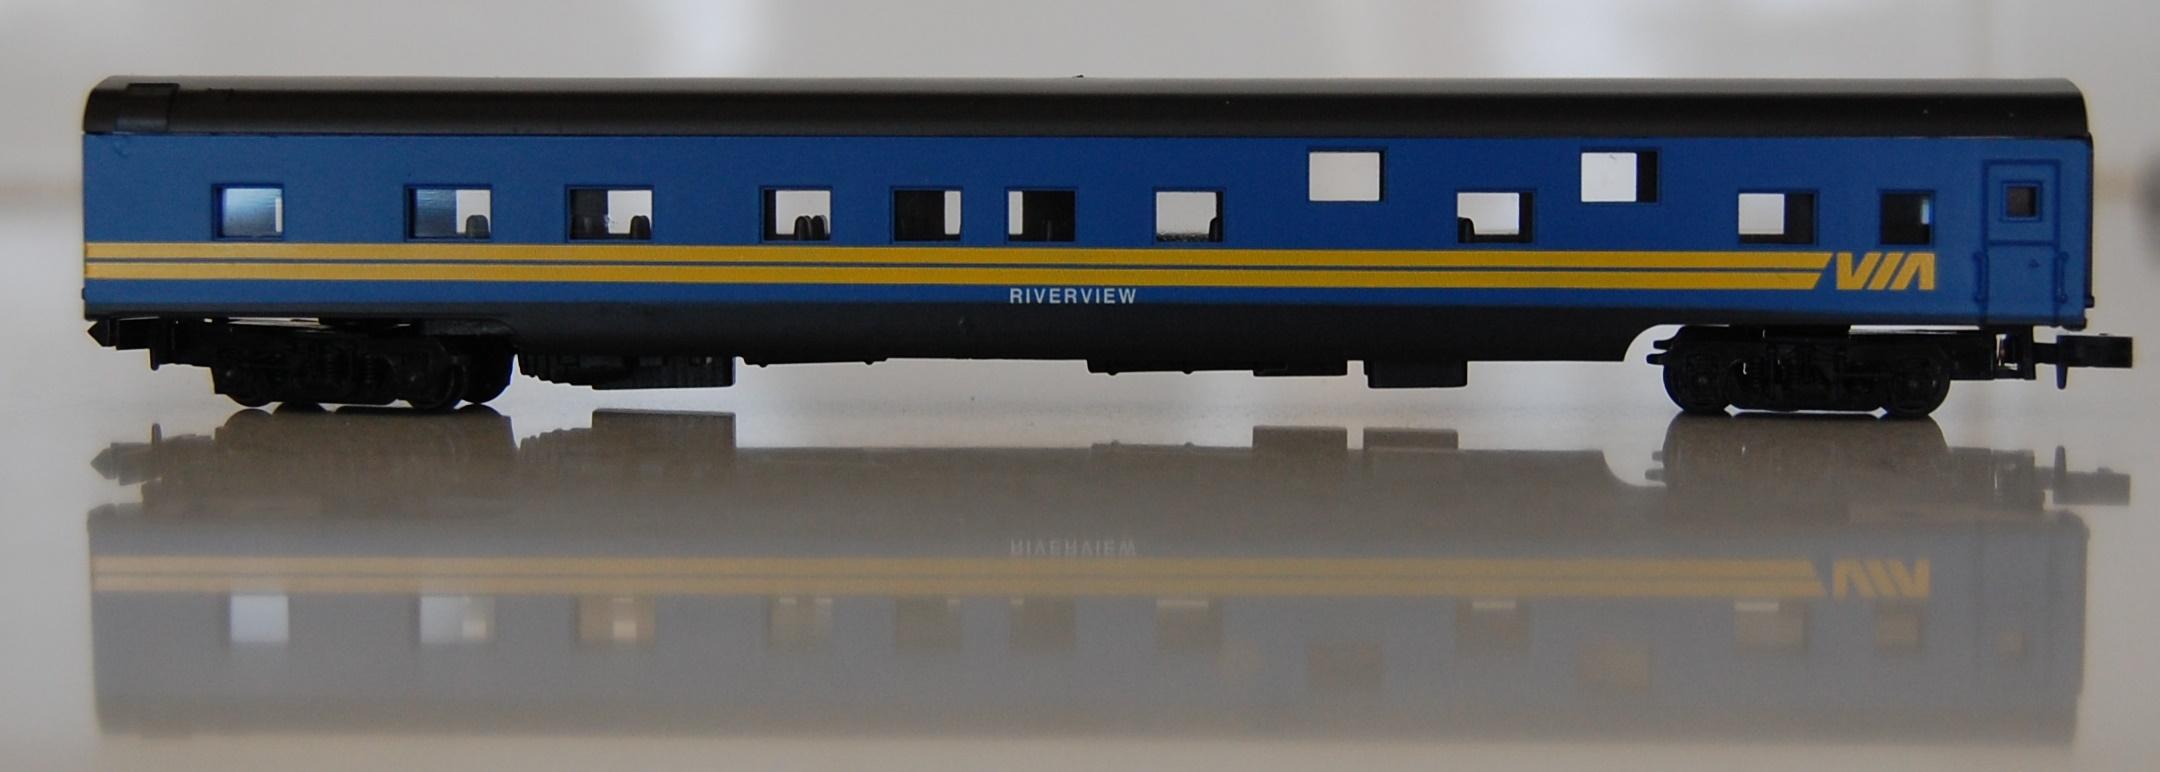 N Scale - Con-Cor - 0001-04012B - Passenger Car, Smoothside, 85 Foot Sleeper - Via Rail Canada - Riverview